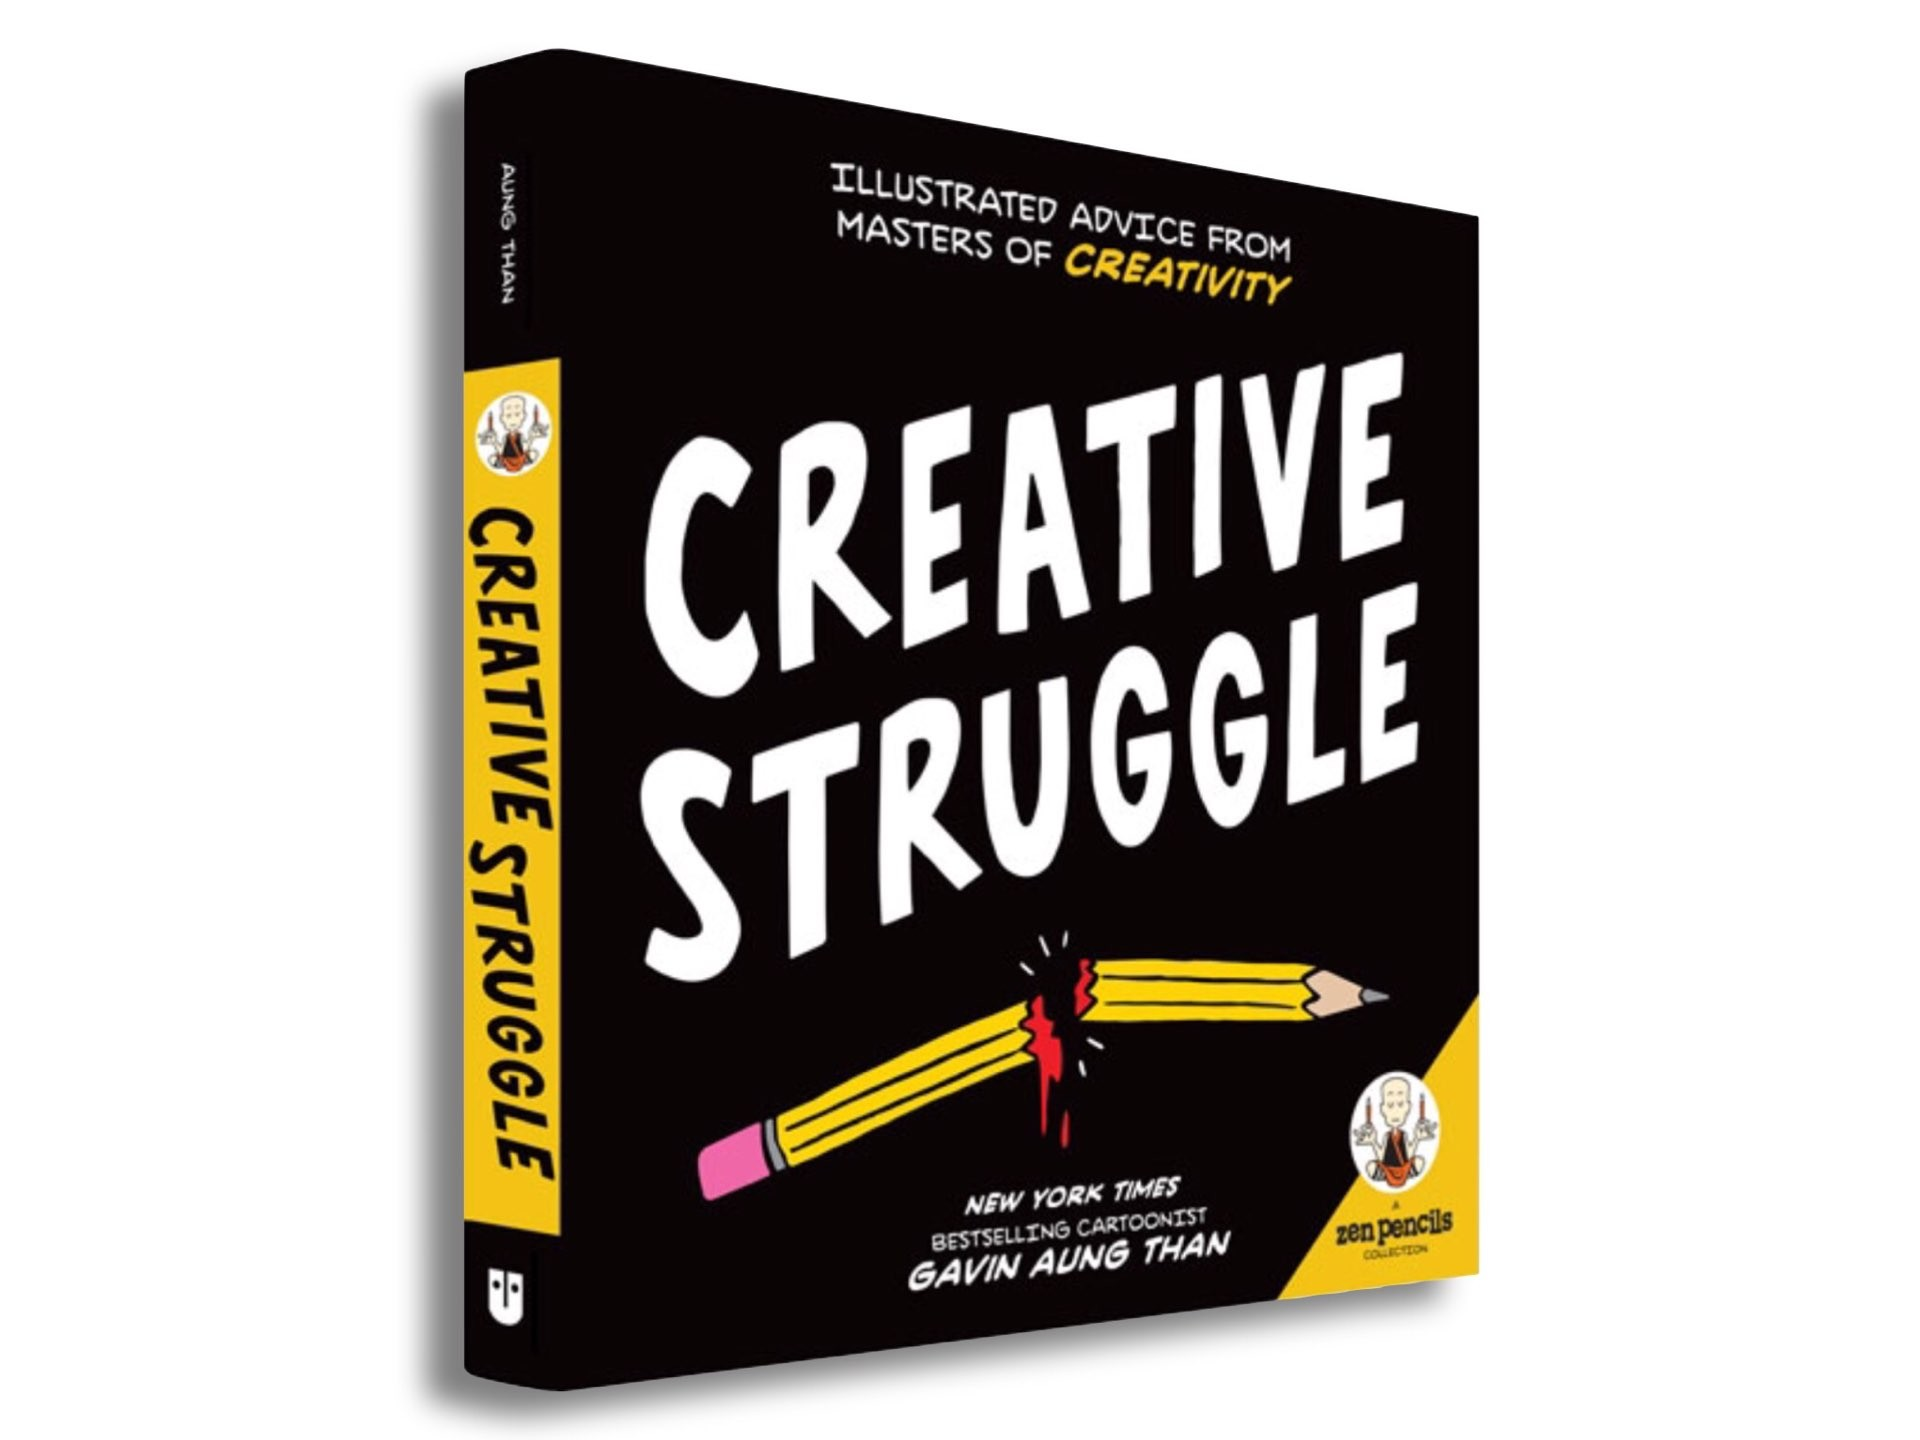 zen-pencils-creative-struggle-by-gavin-aung-than